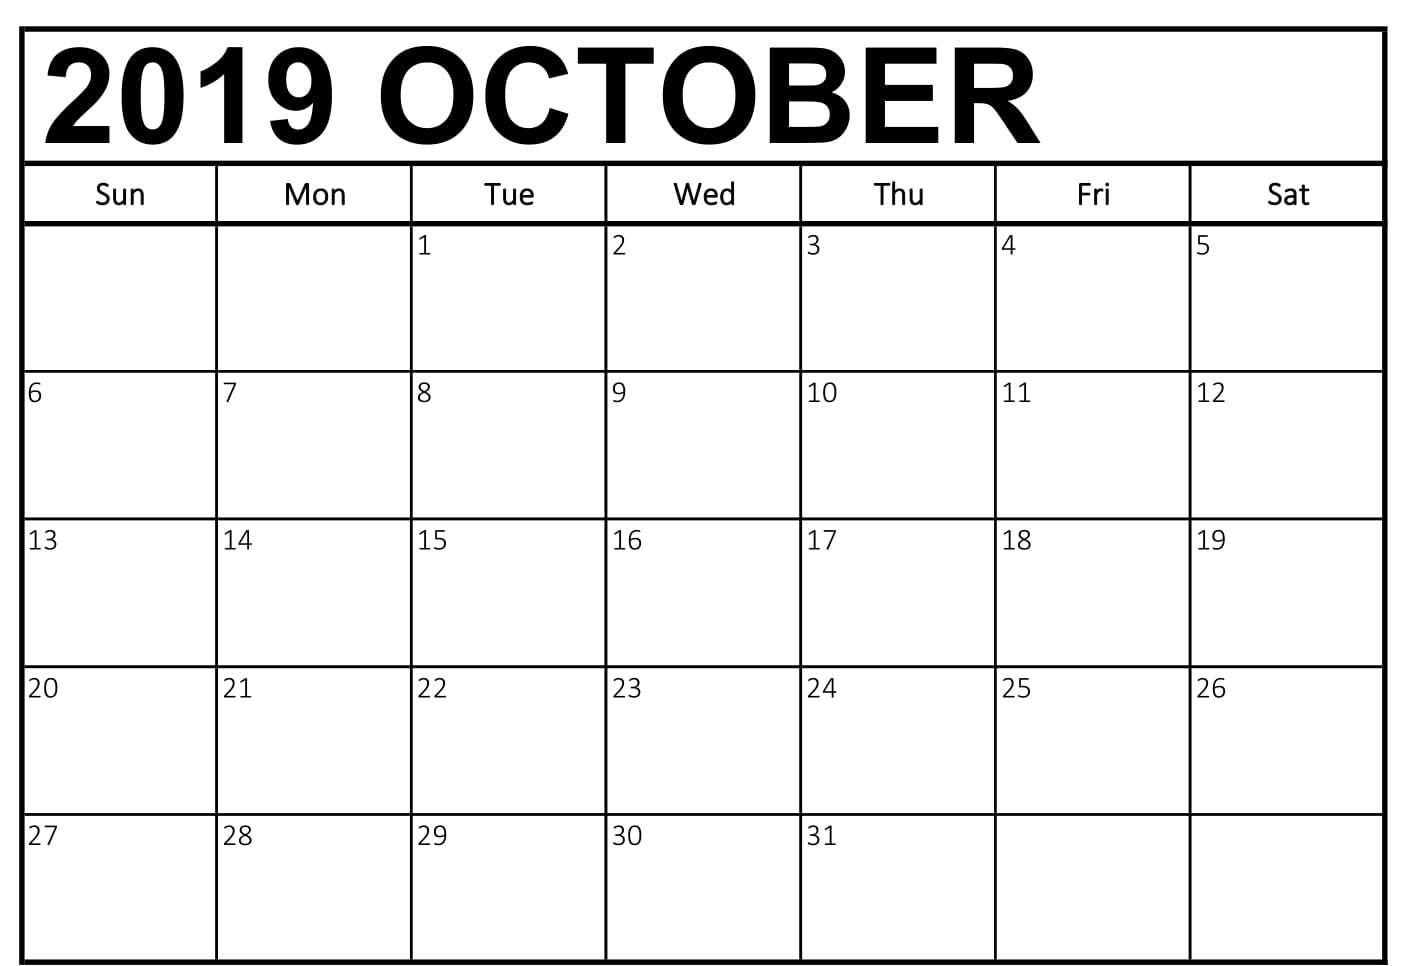 Free October 2019 Calendar Printable Templates Download Calendar